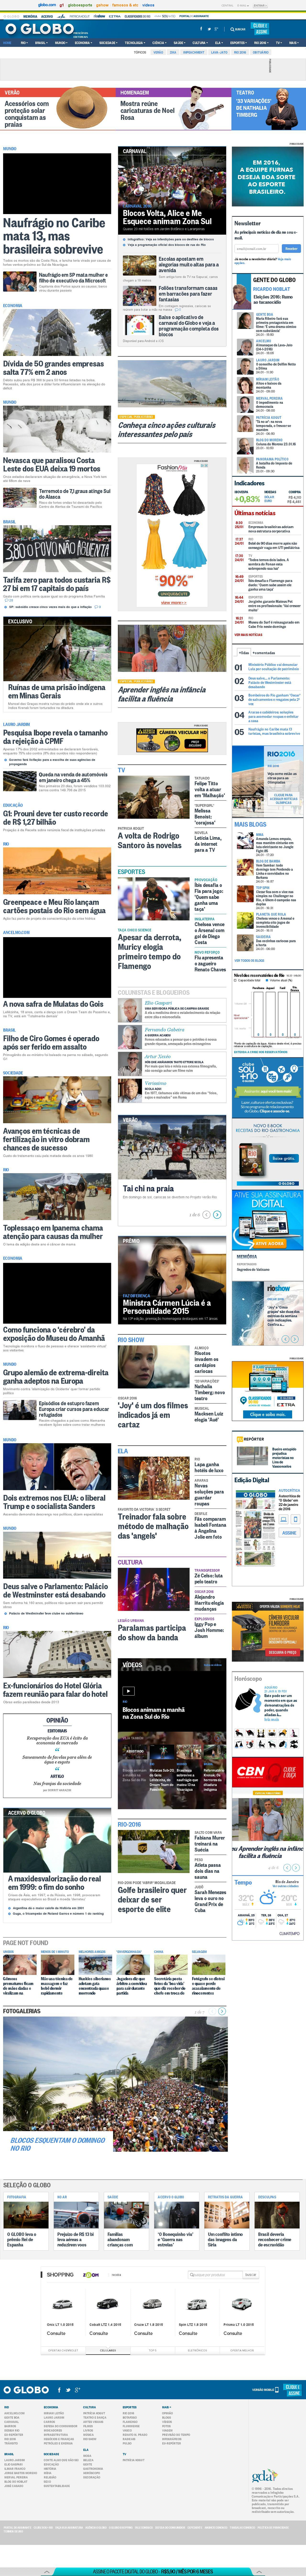 O Globo at Sunday Jan. 24, 2016, 8:08 p.m. UTC